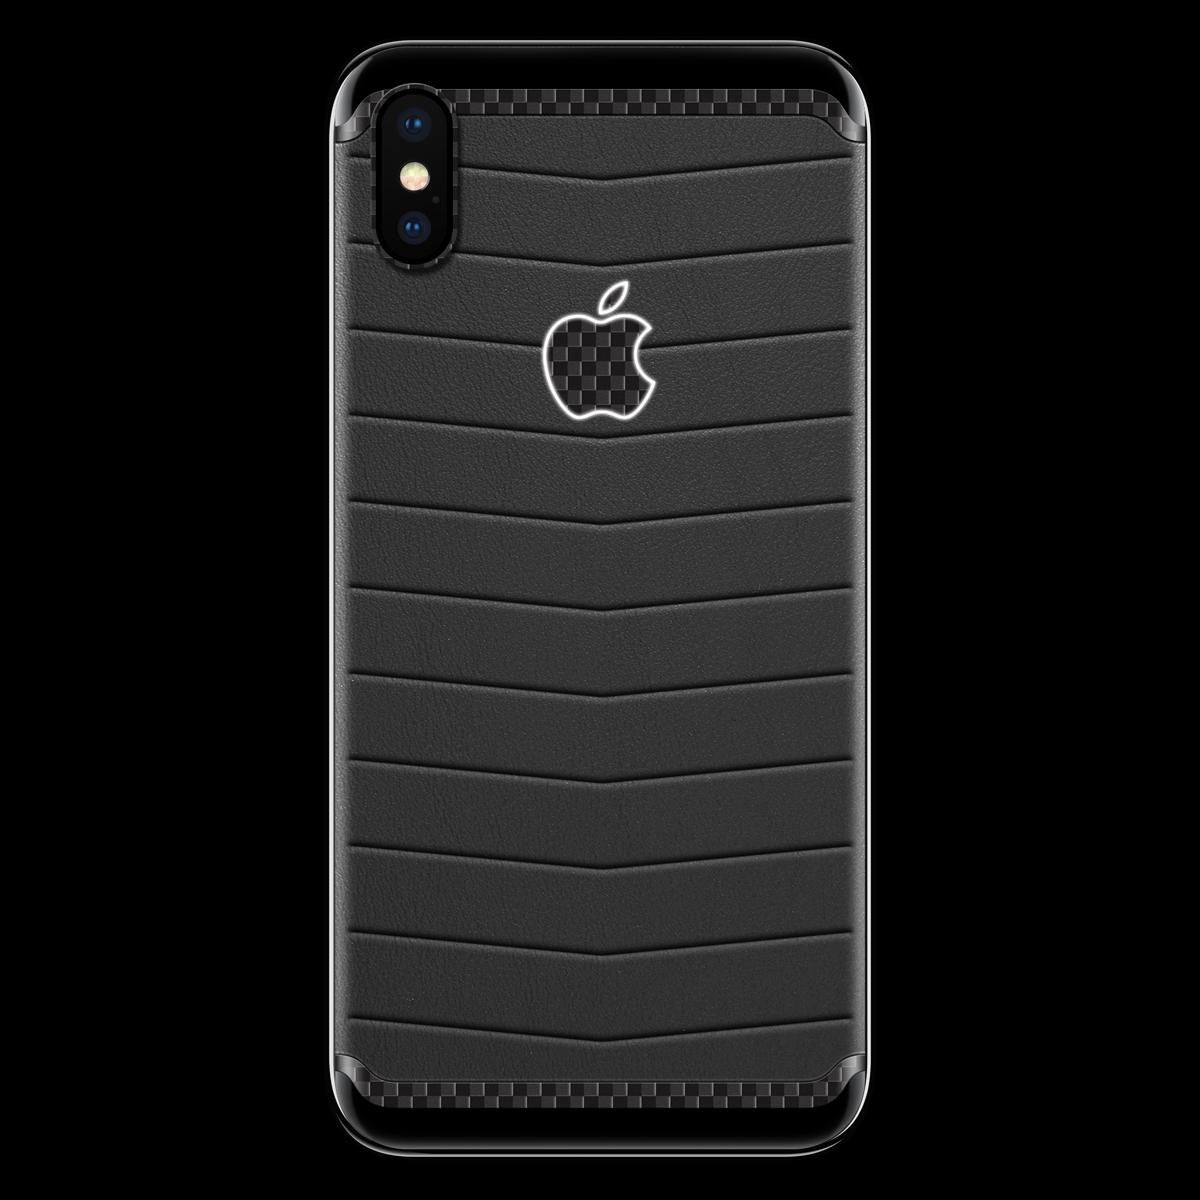 Моддинг iPhone X Светящийся логотип